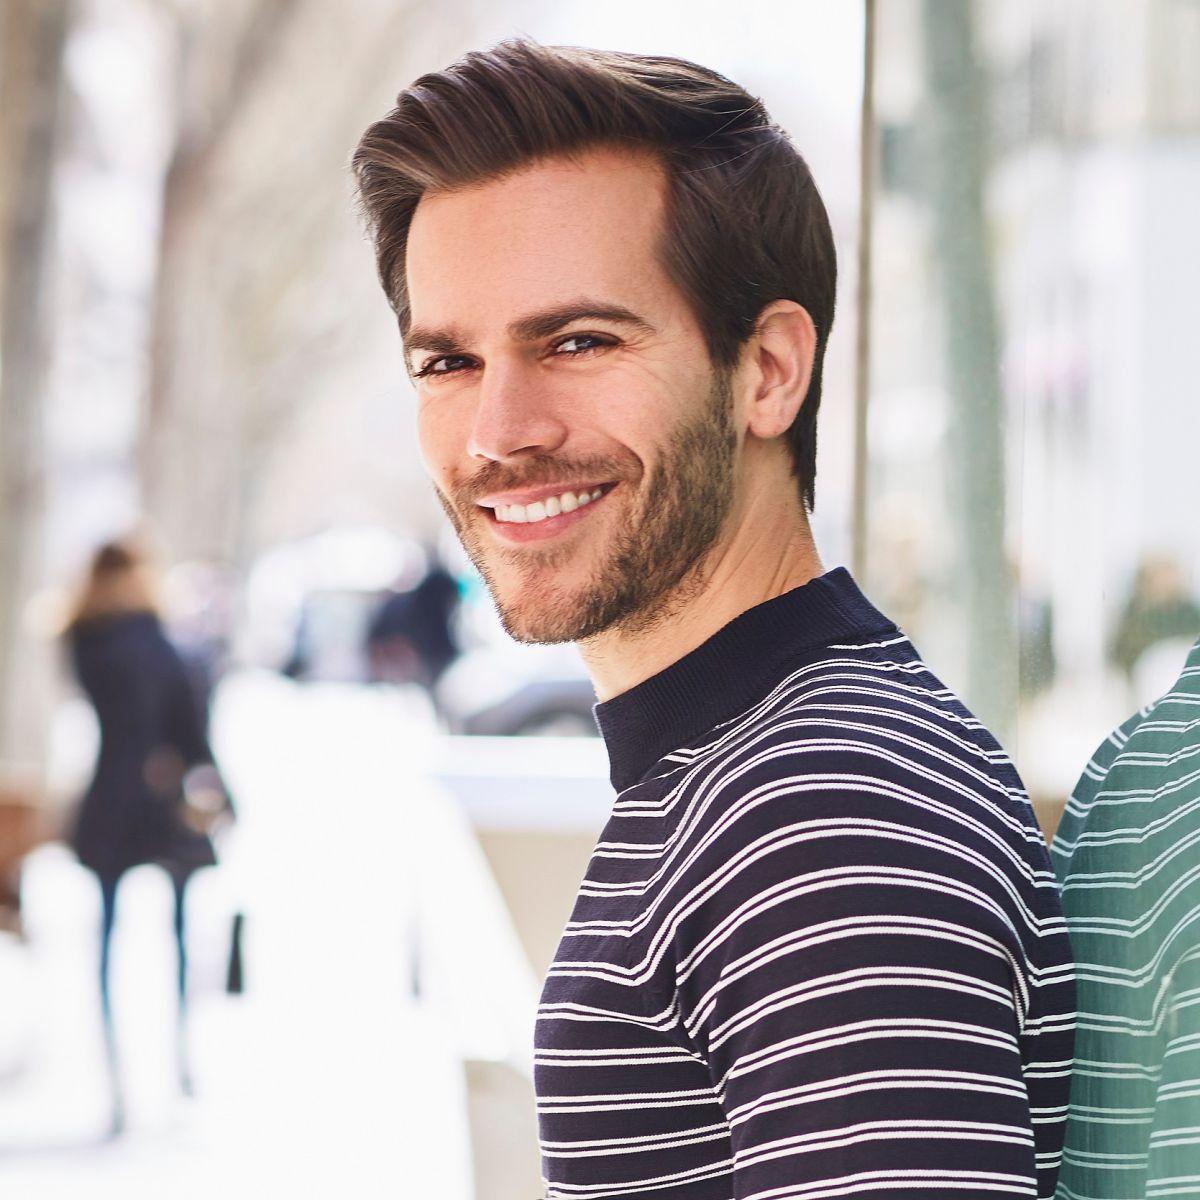 Marc Clotet se integra a elenco de 'Por amar sin ley 2', telenovela de Univision y Televisa